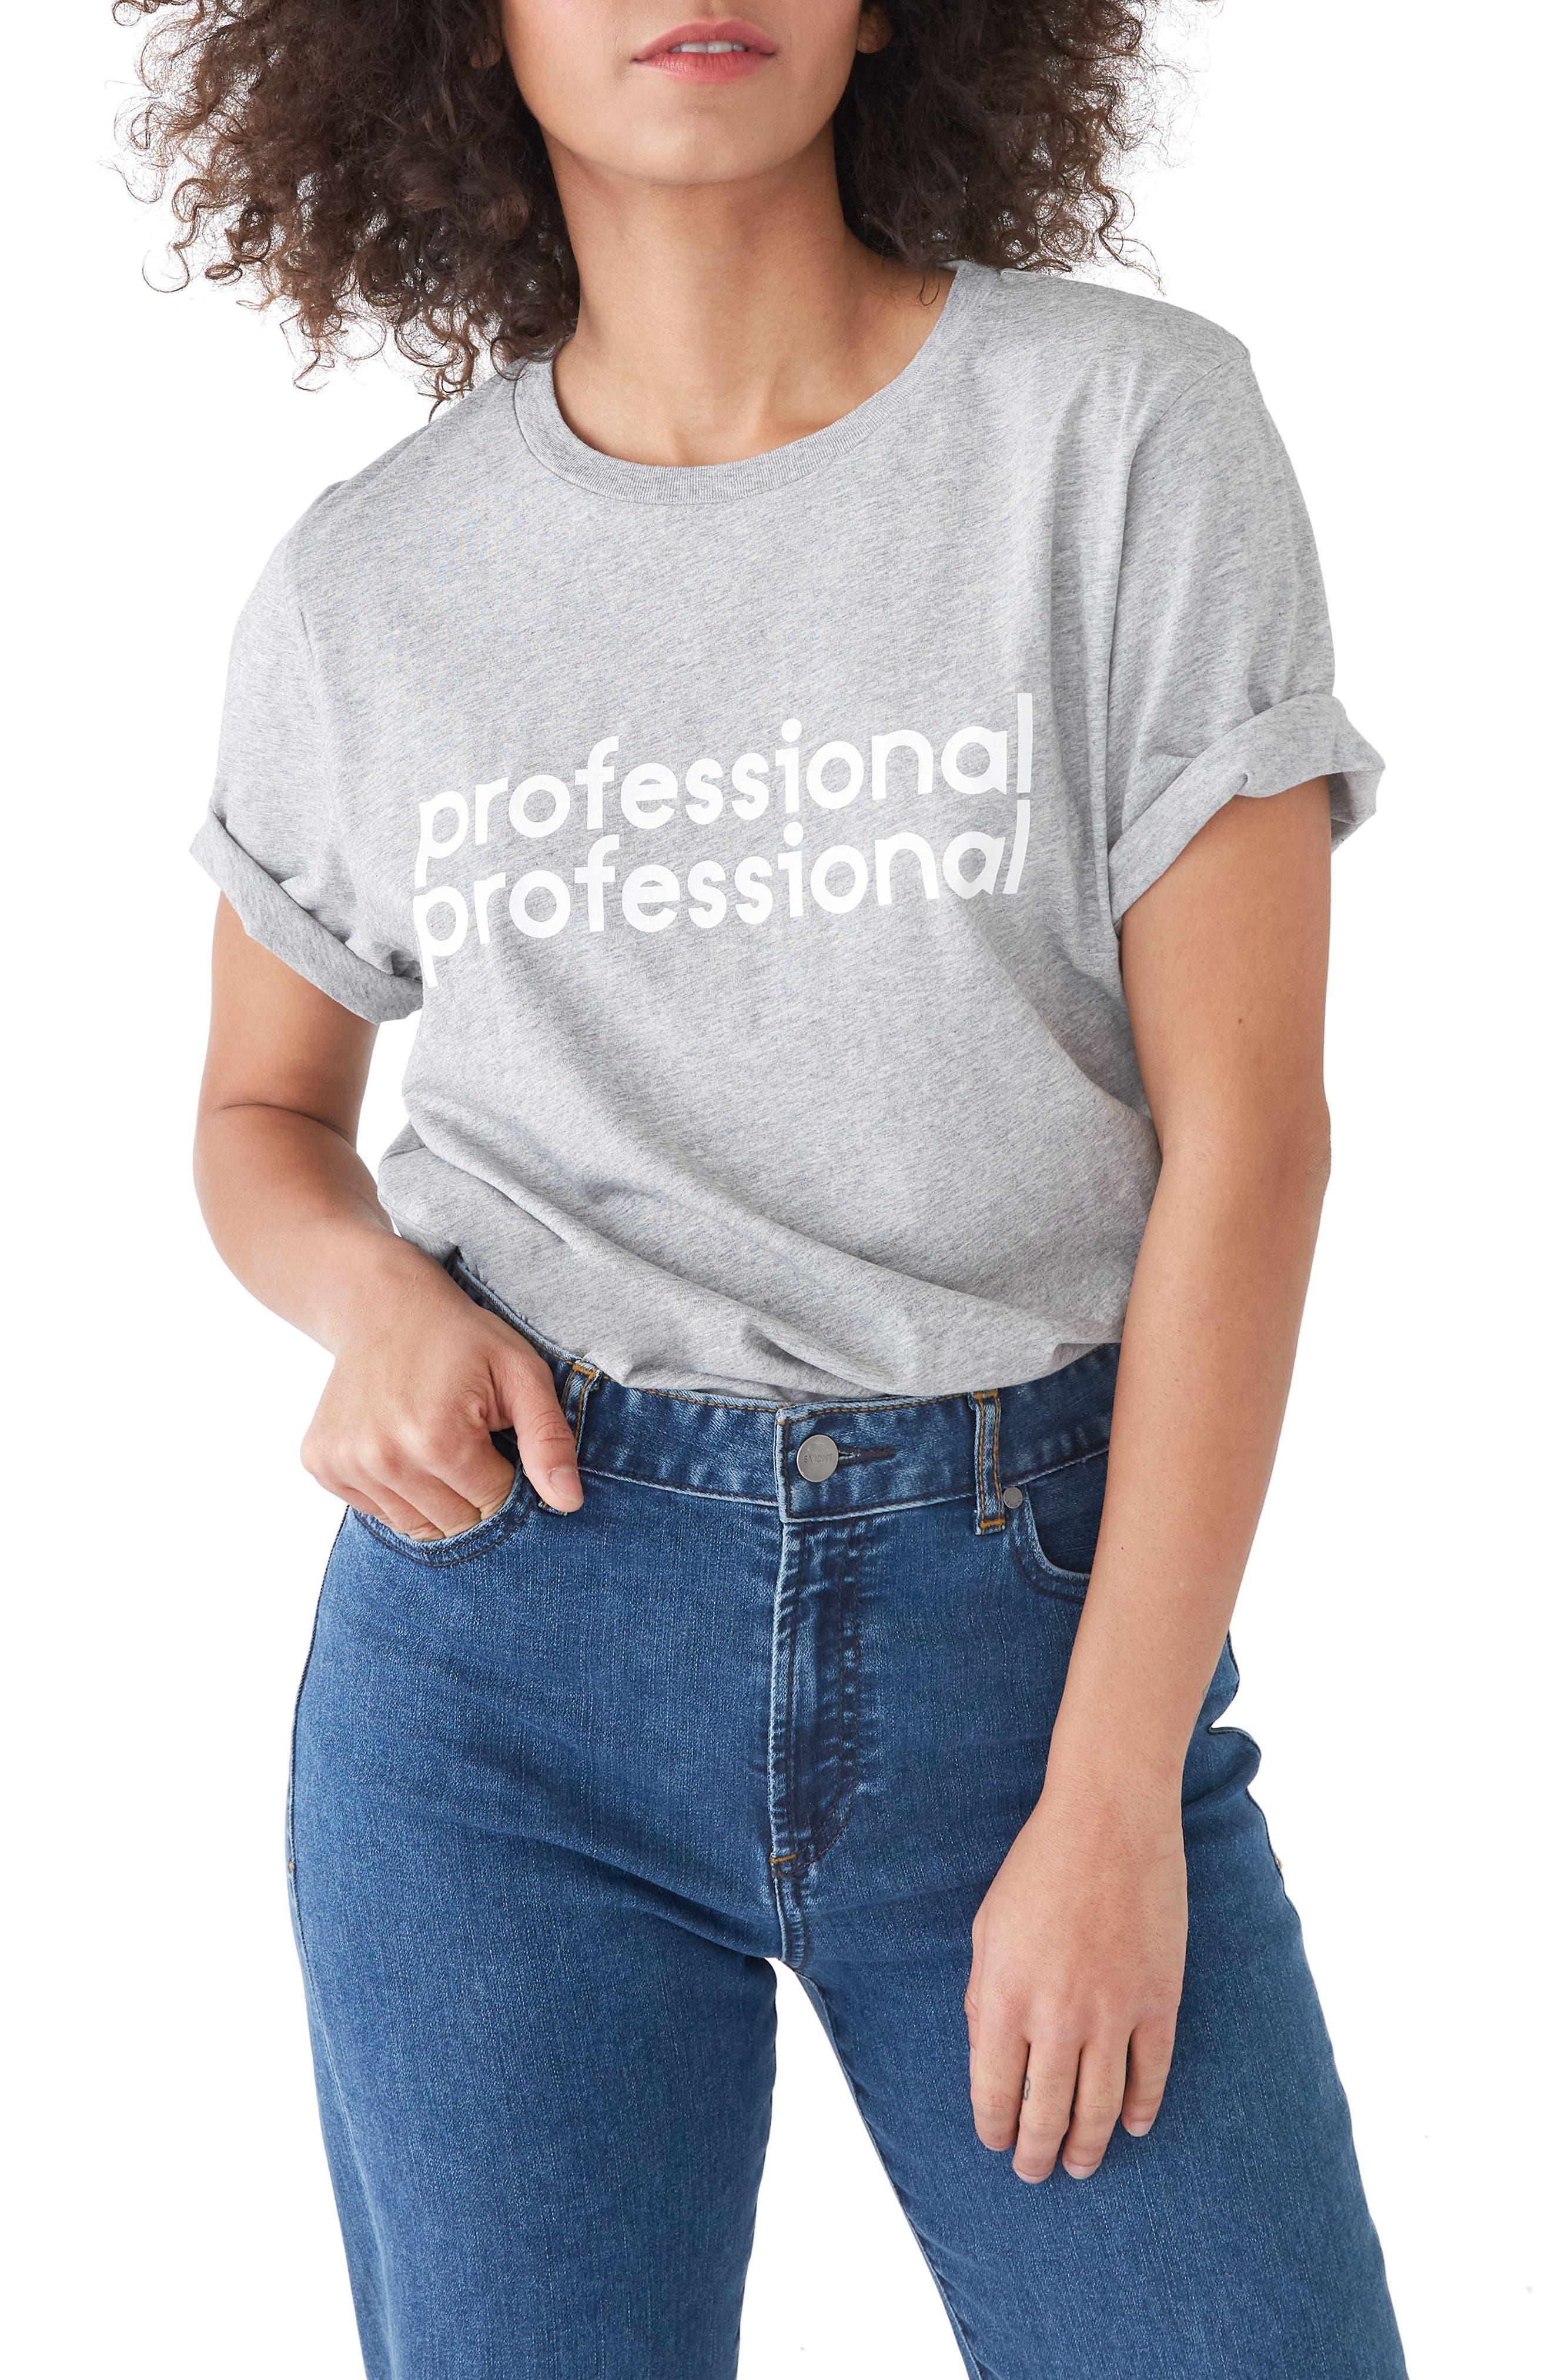 ban.do Professional Professional Classic Tee